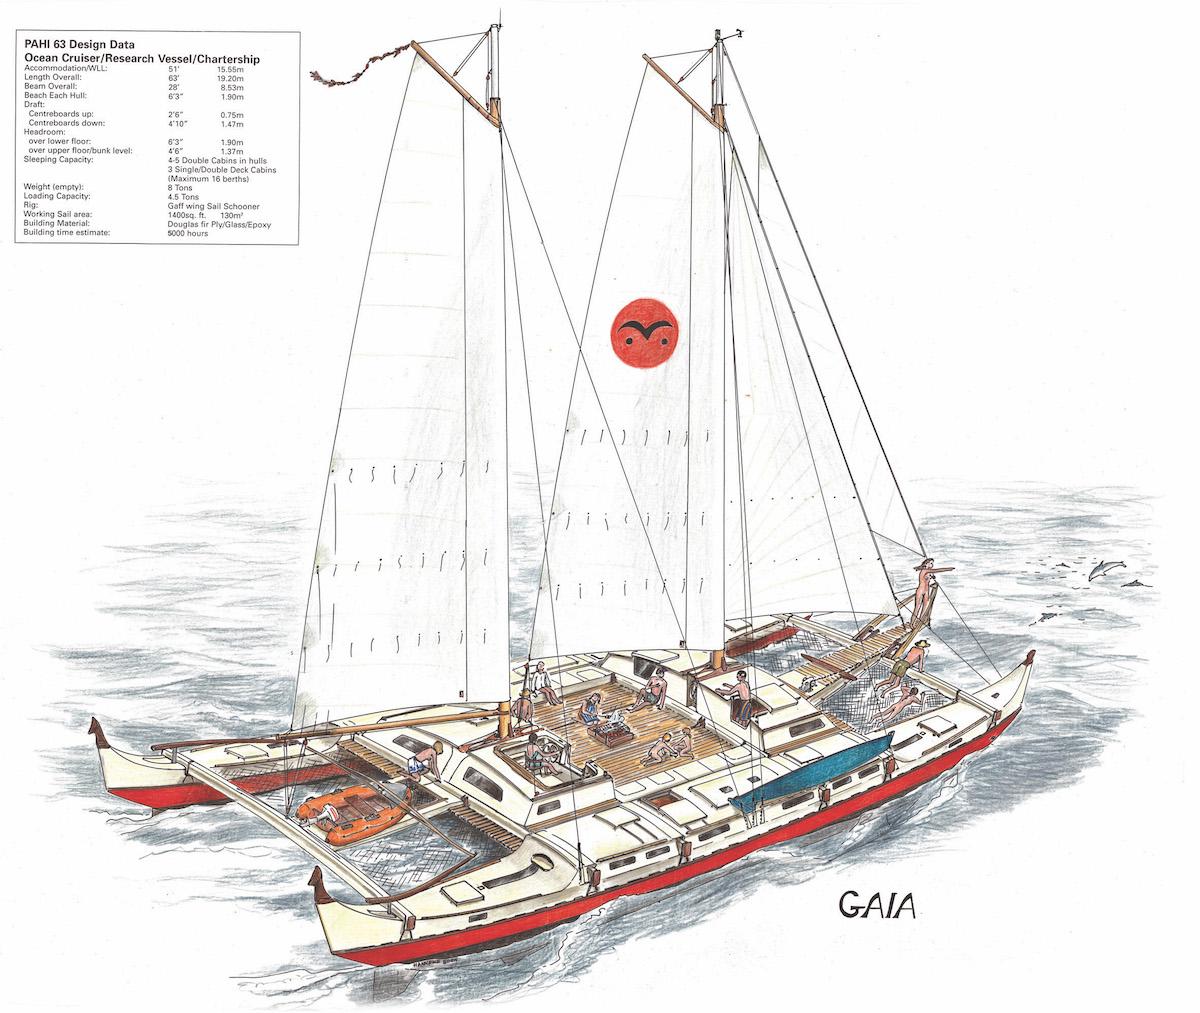 British designer James Wharram's round-the-world adventure on Spirit of Gaia - Practical Boat Owner